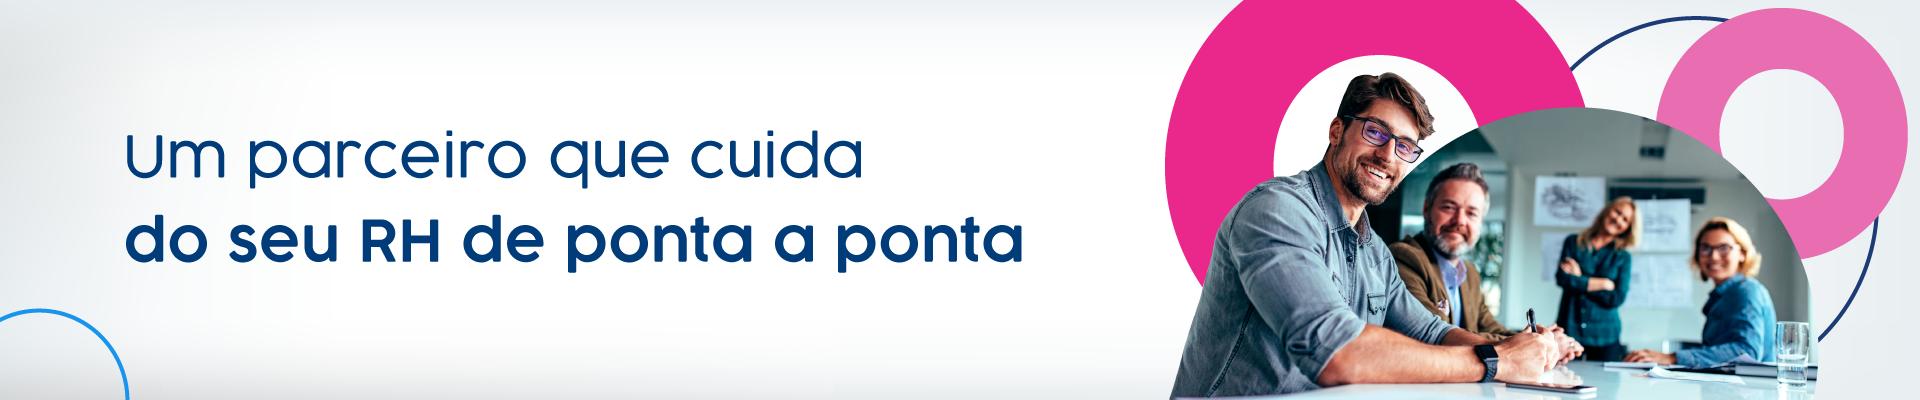 propay-folha